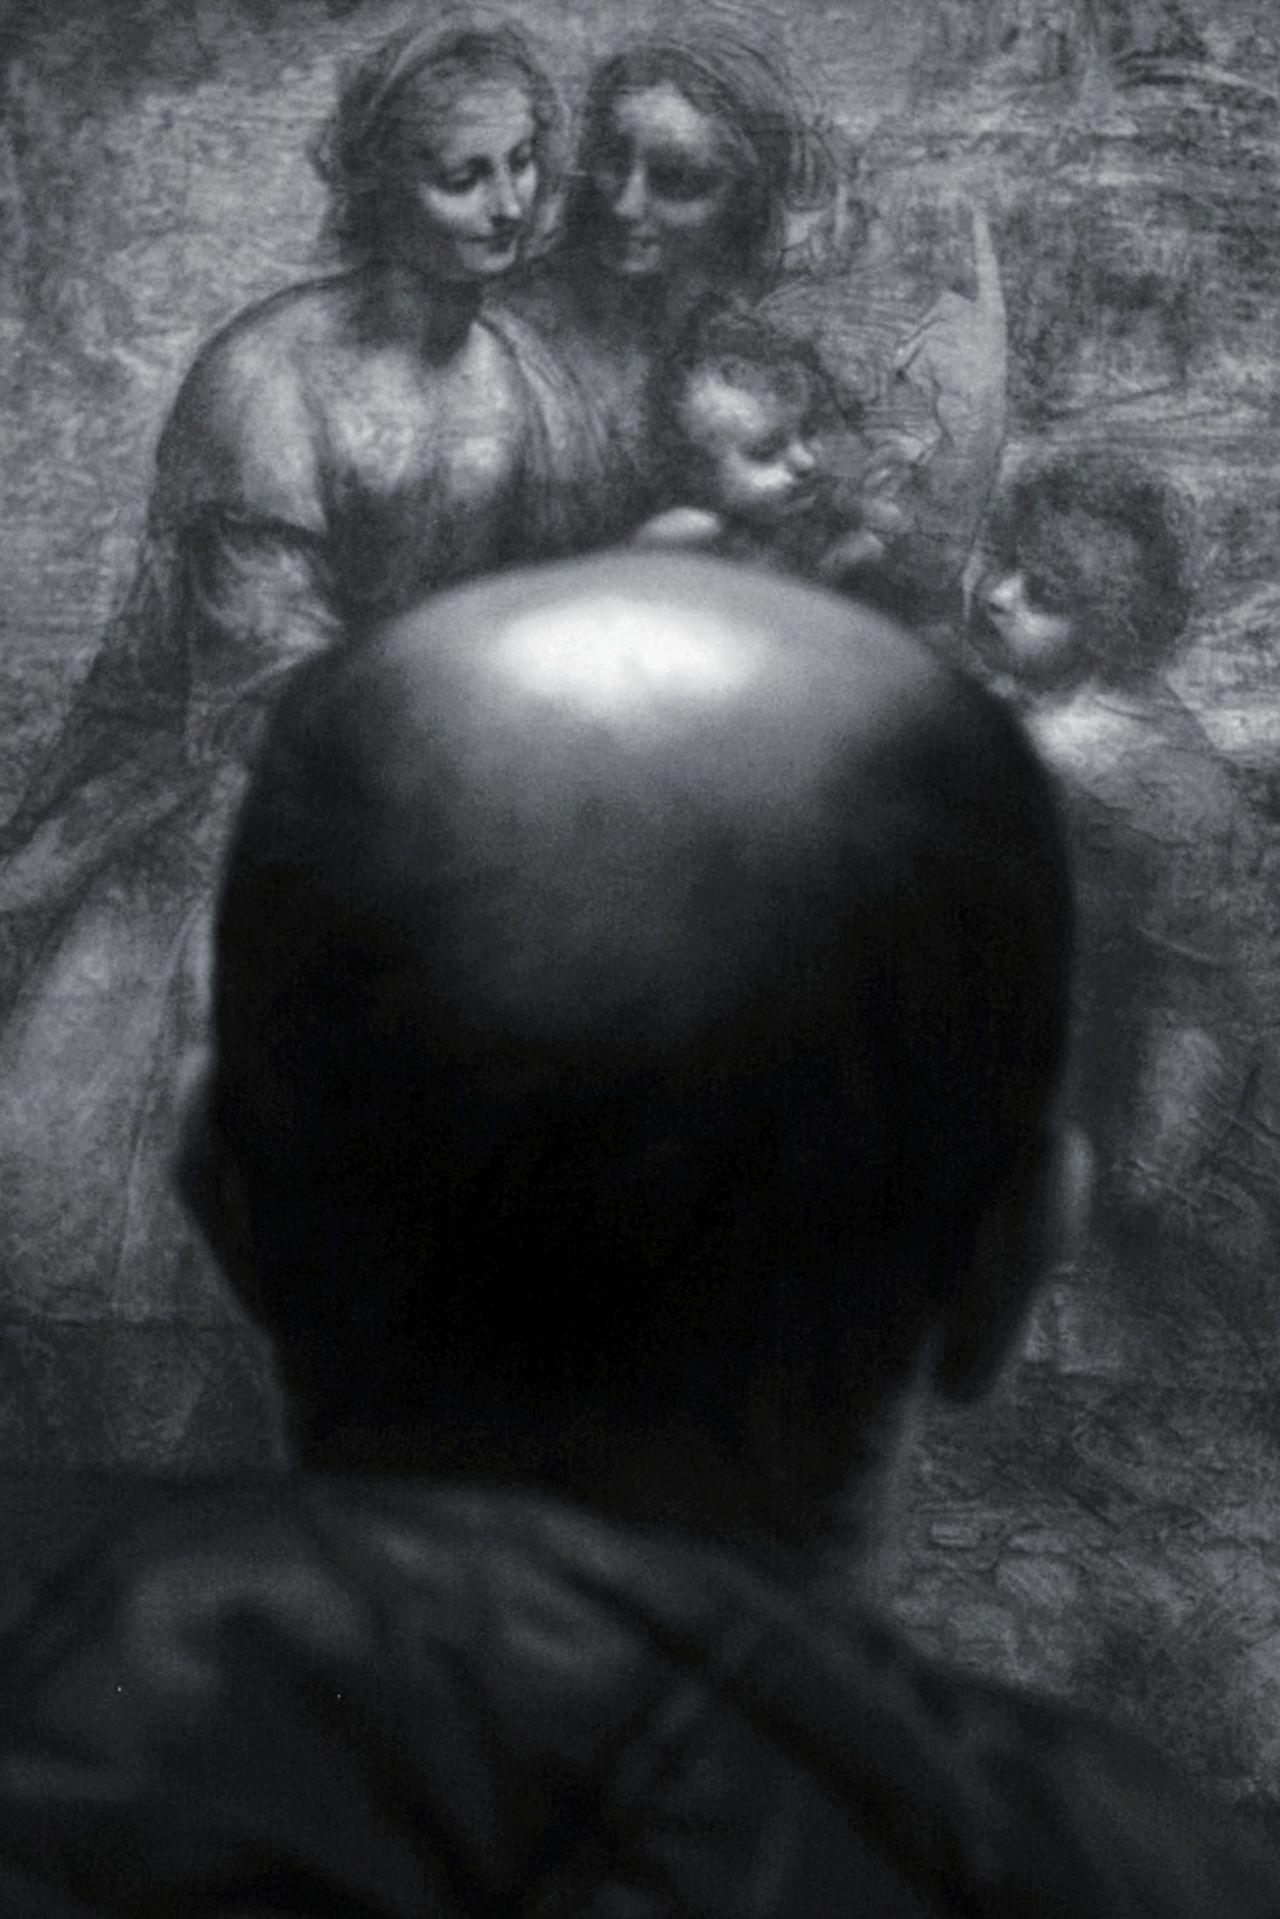 National Gallery  National Gallery Of Art Leonardo Da Vinci Focus On Shadow Paint Painting Man Man Made Object Manual Focus